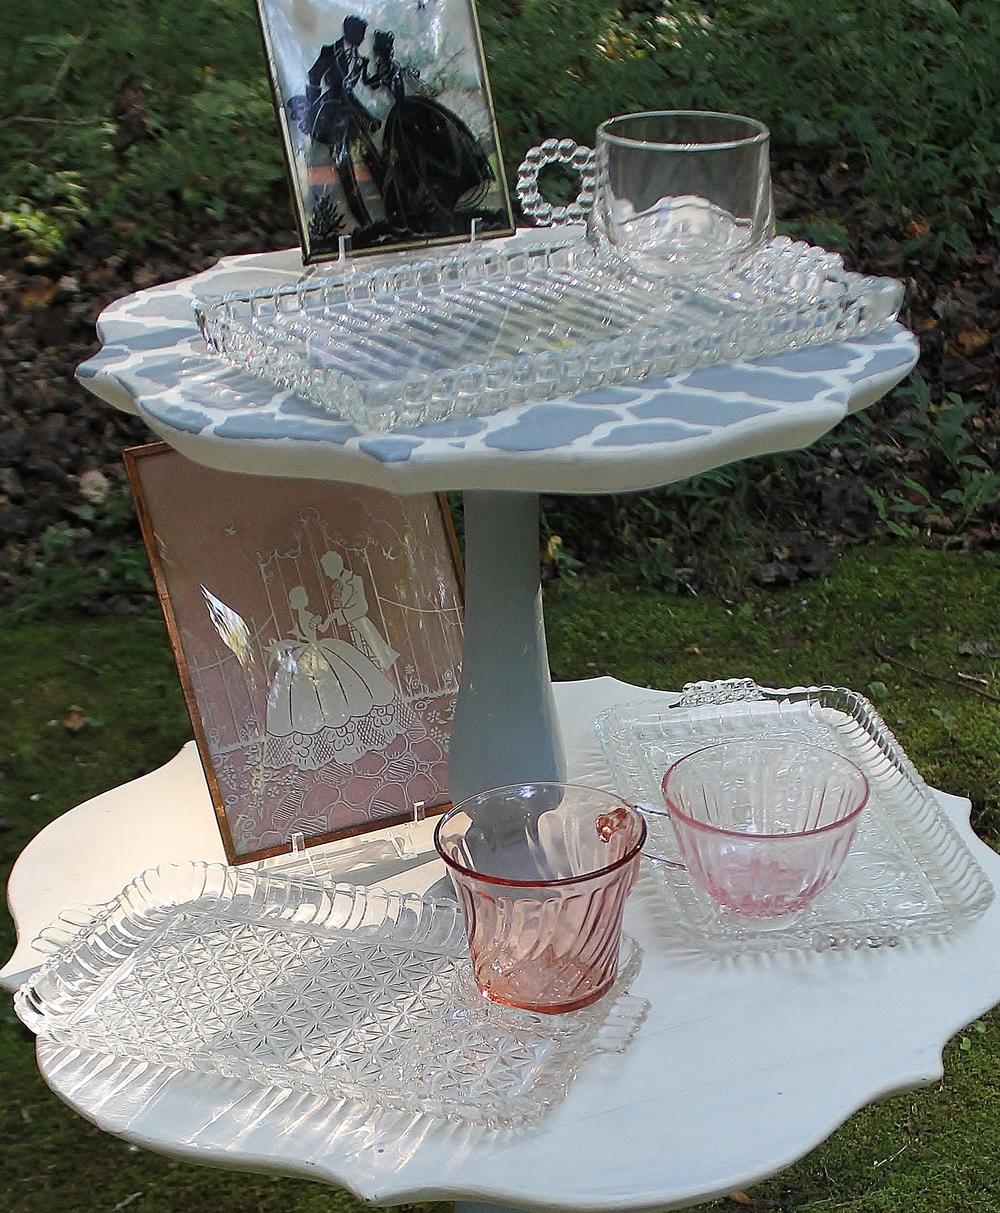 Vintage luncheon plate rentals